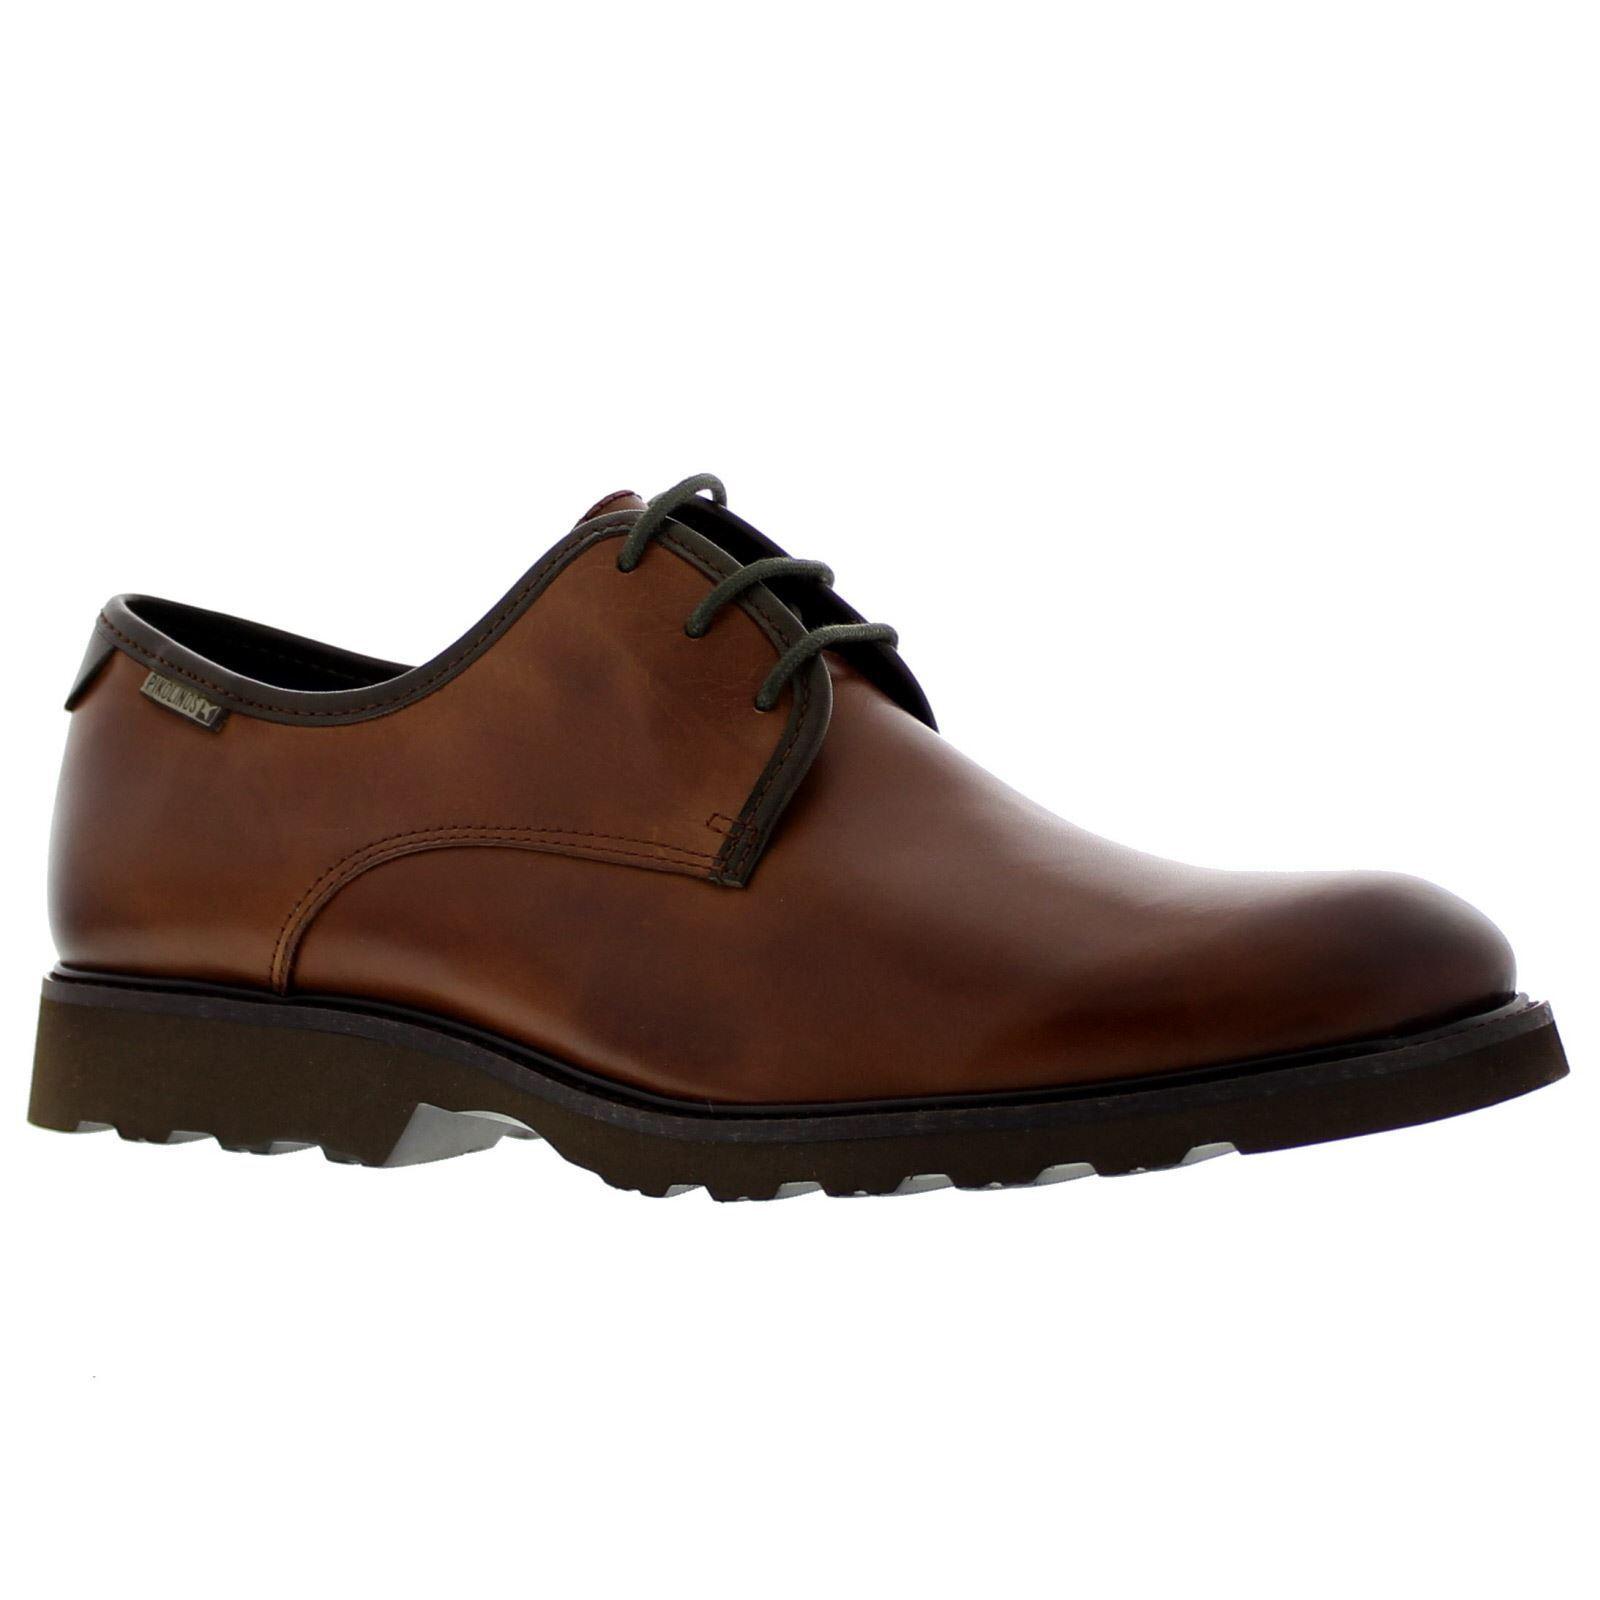 Pikolinos Glasgow M05-6545C1 Cuero Mens Leather Low-profile Lace-up Derby Shoes